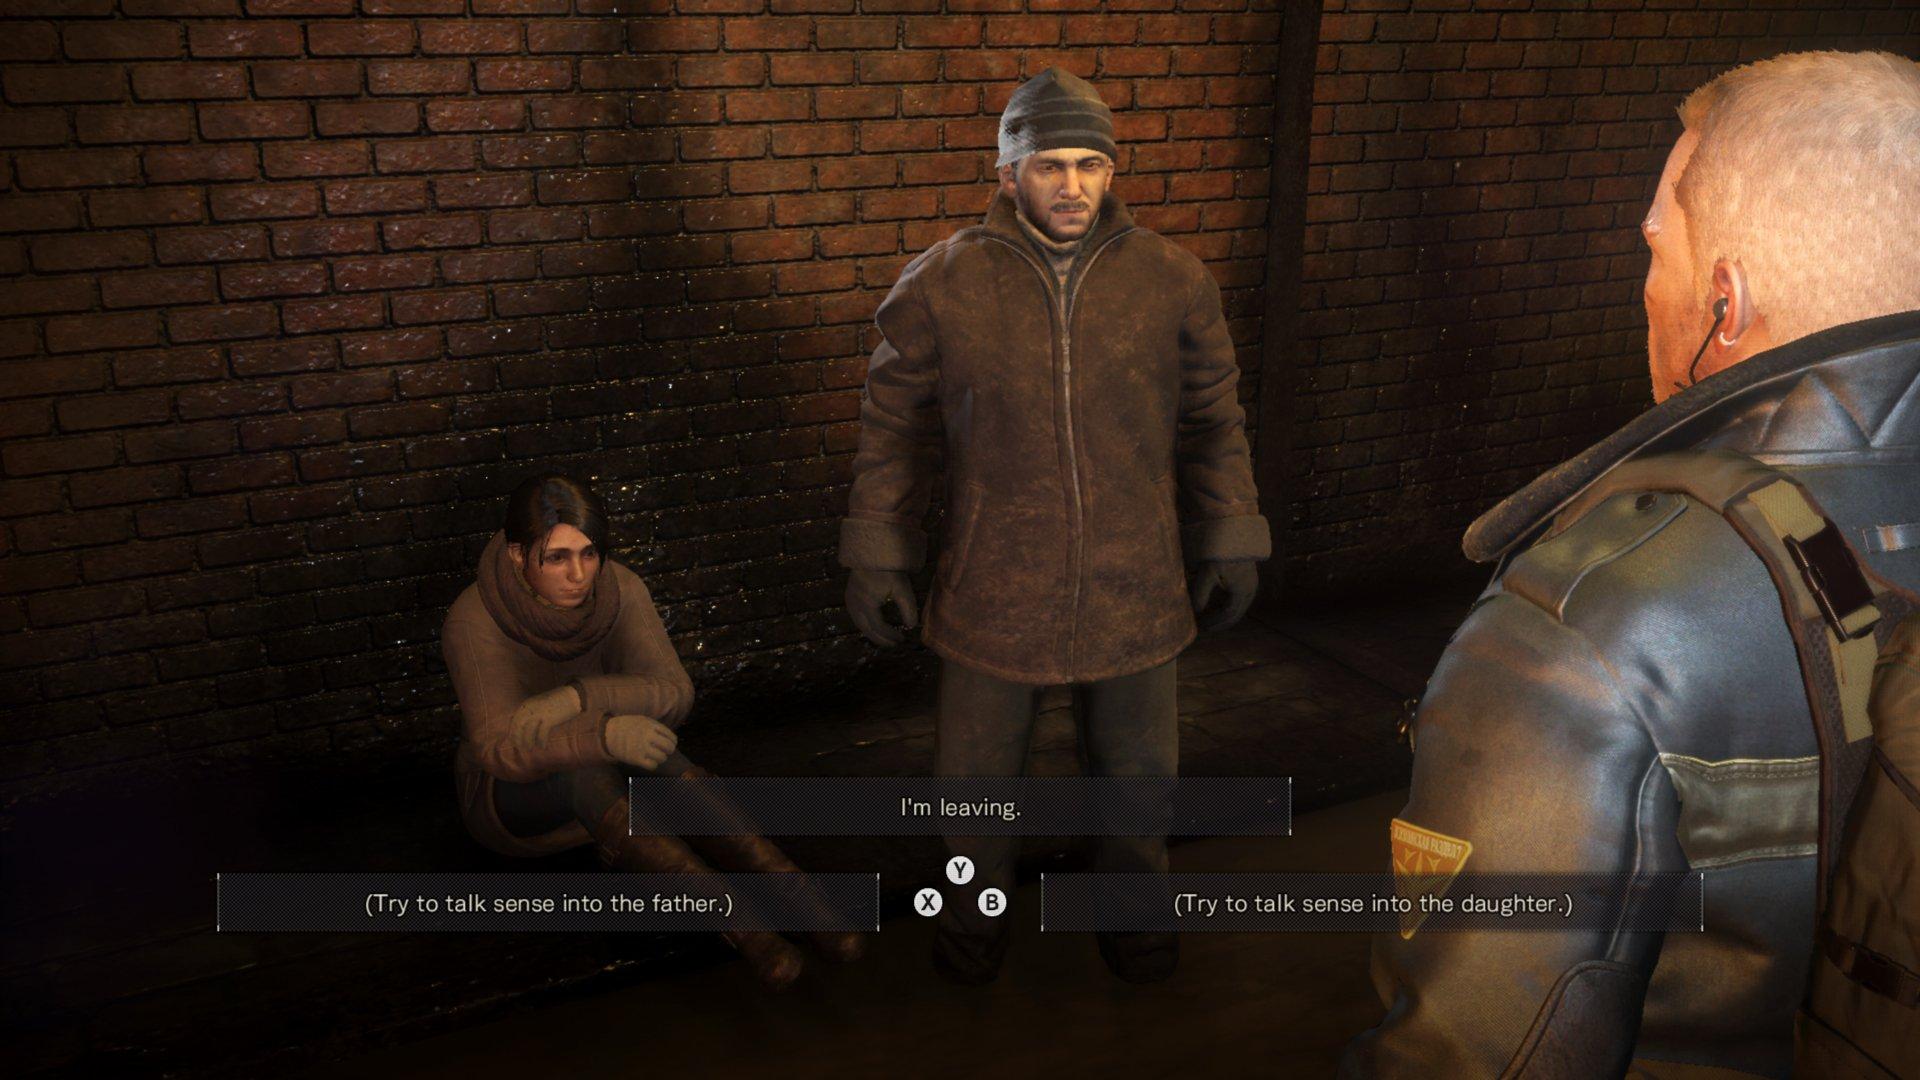 mira-las-nuevas-imagenes3-de-left-alive-de-square-enix-frikikigamers.com